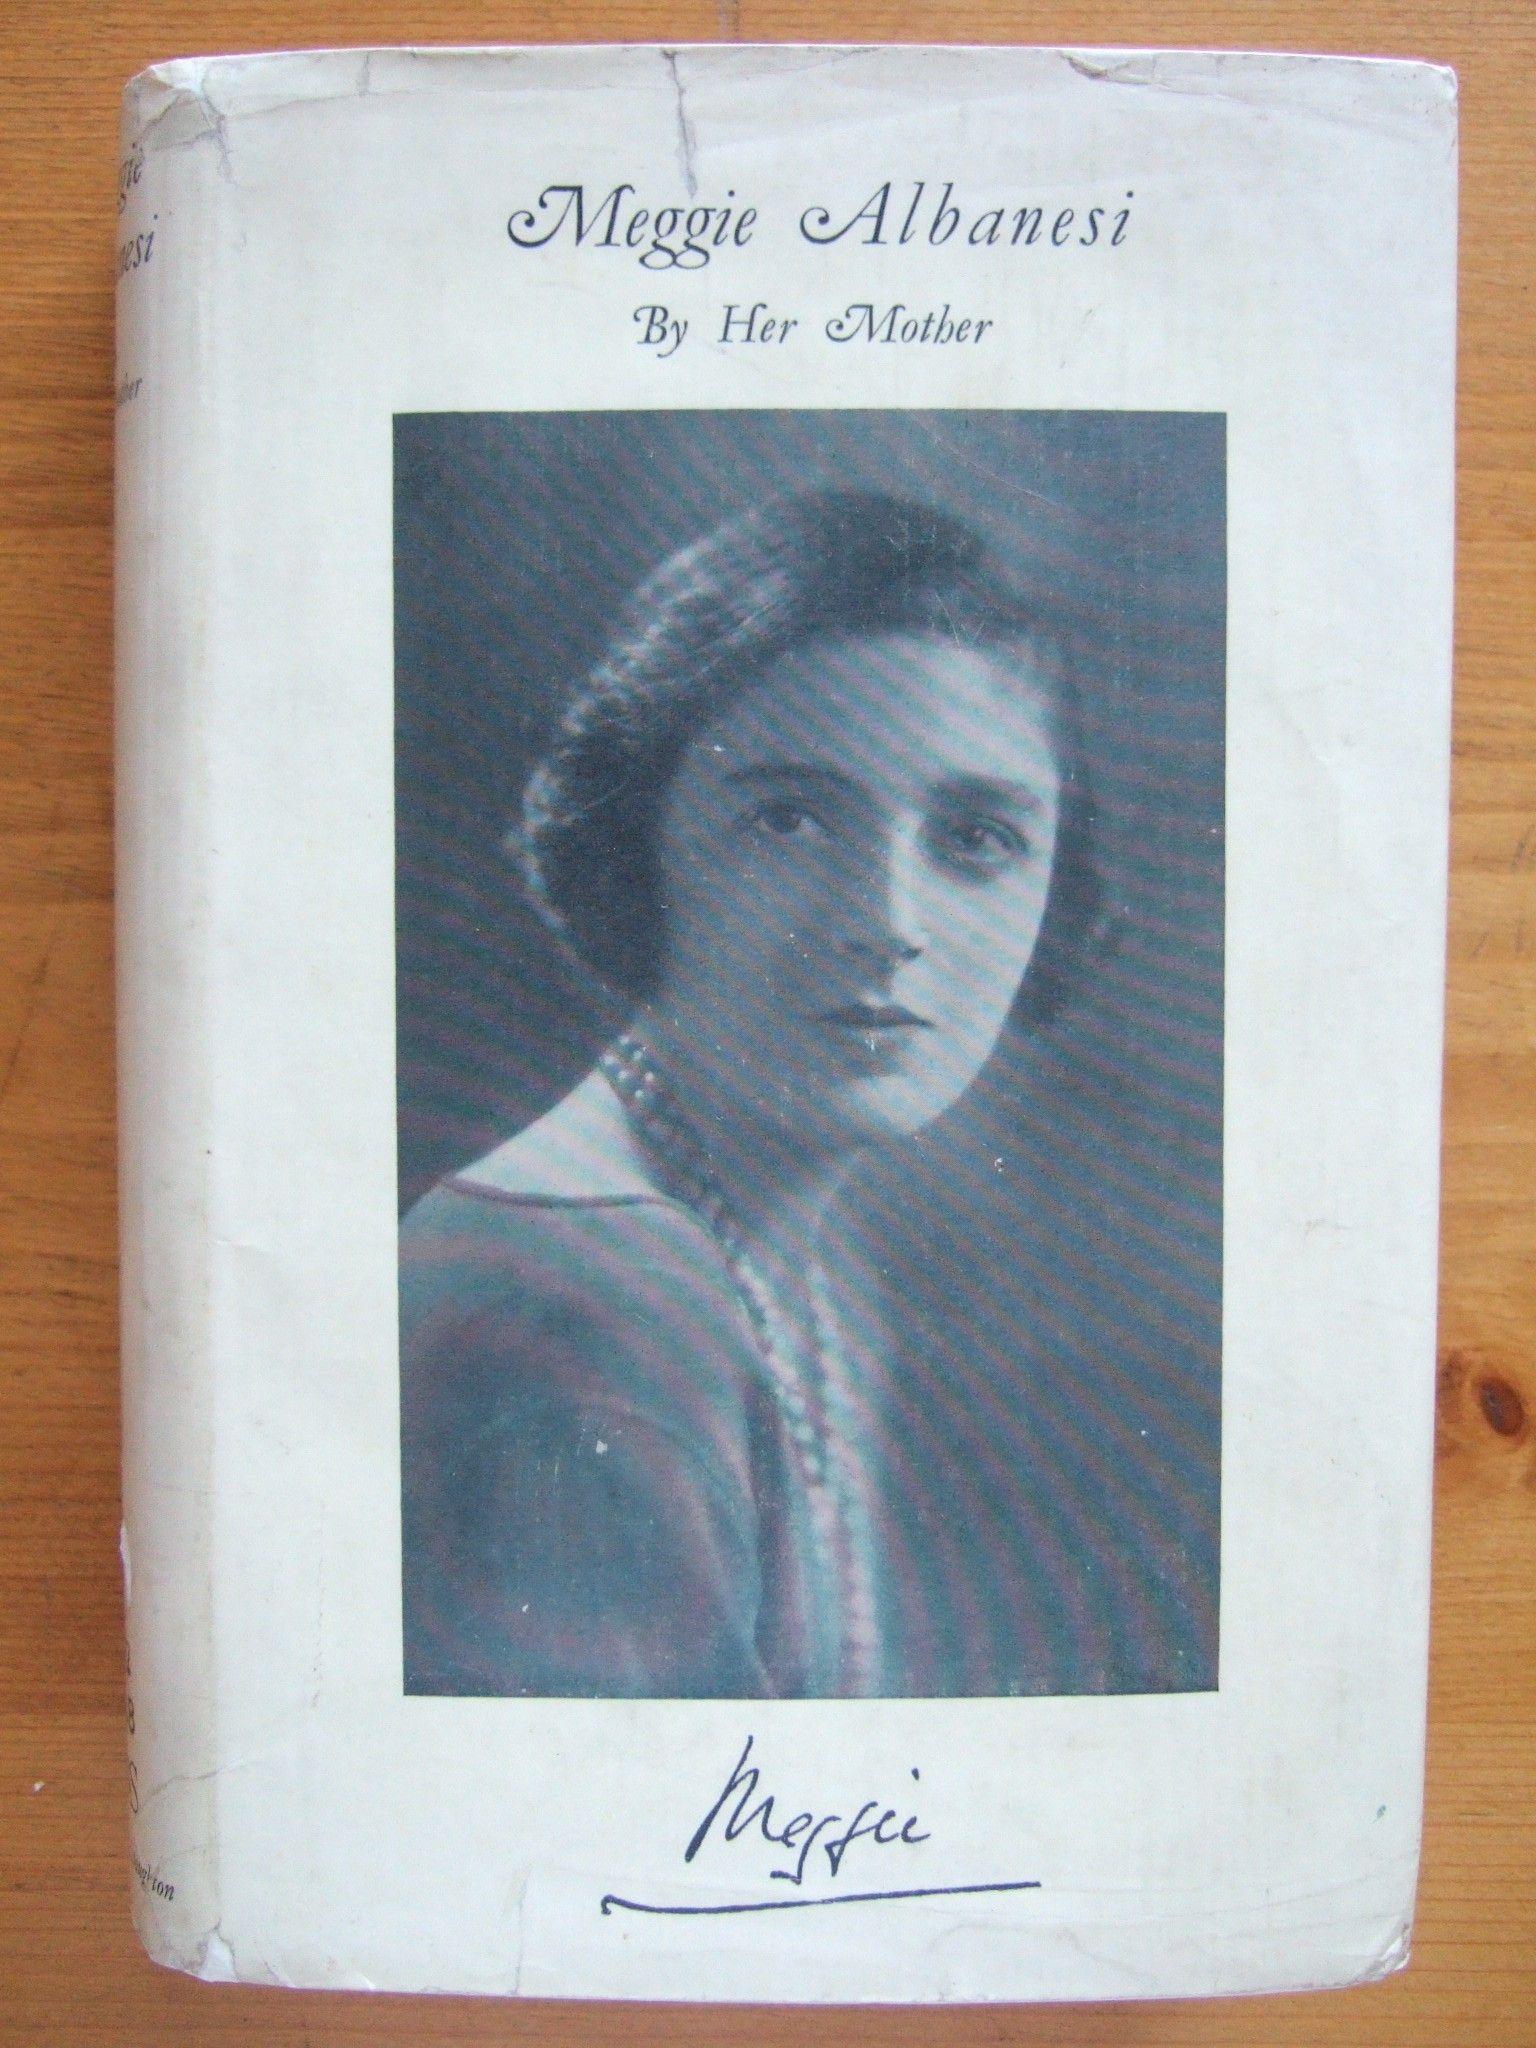 Meggie Albanesi